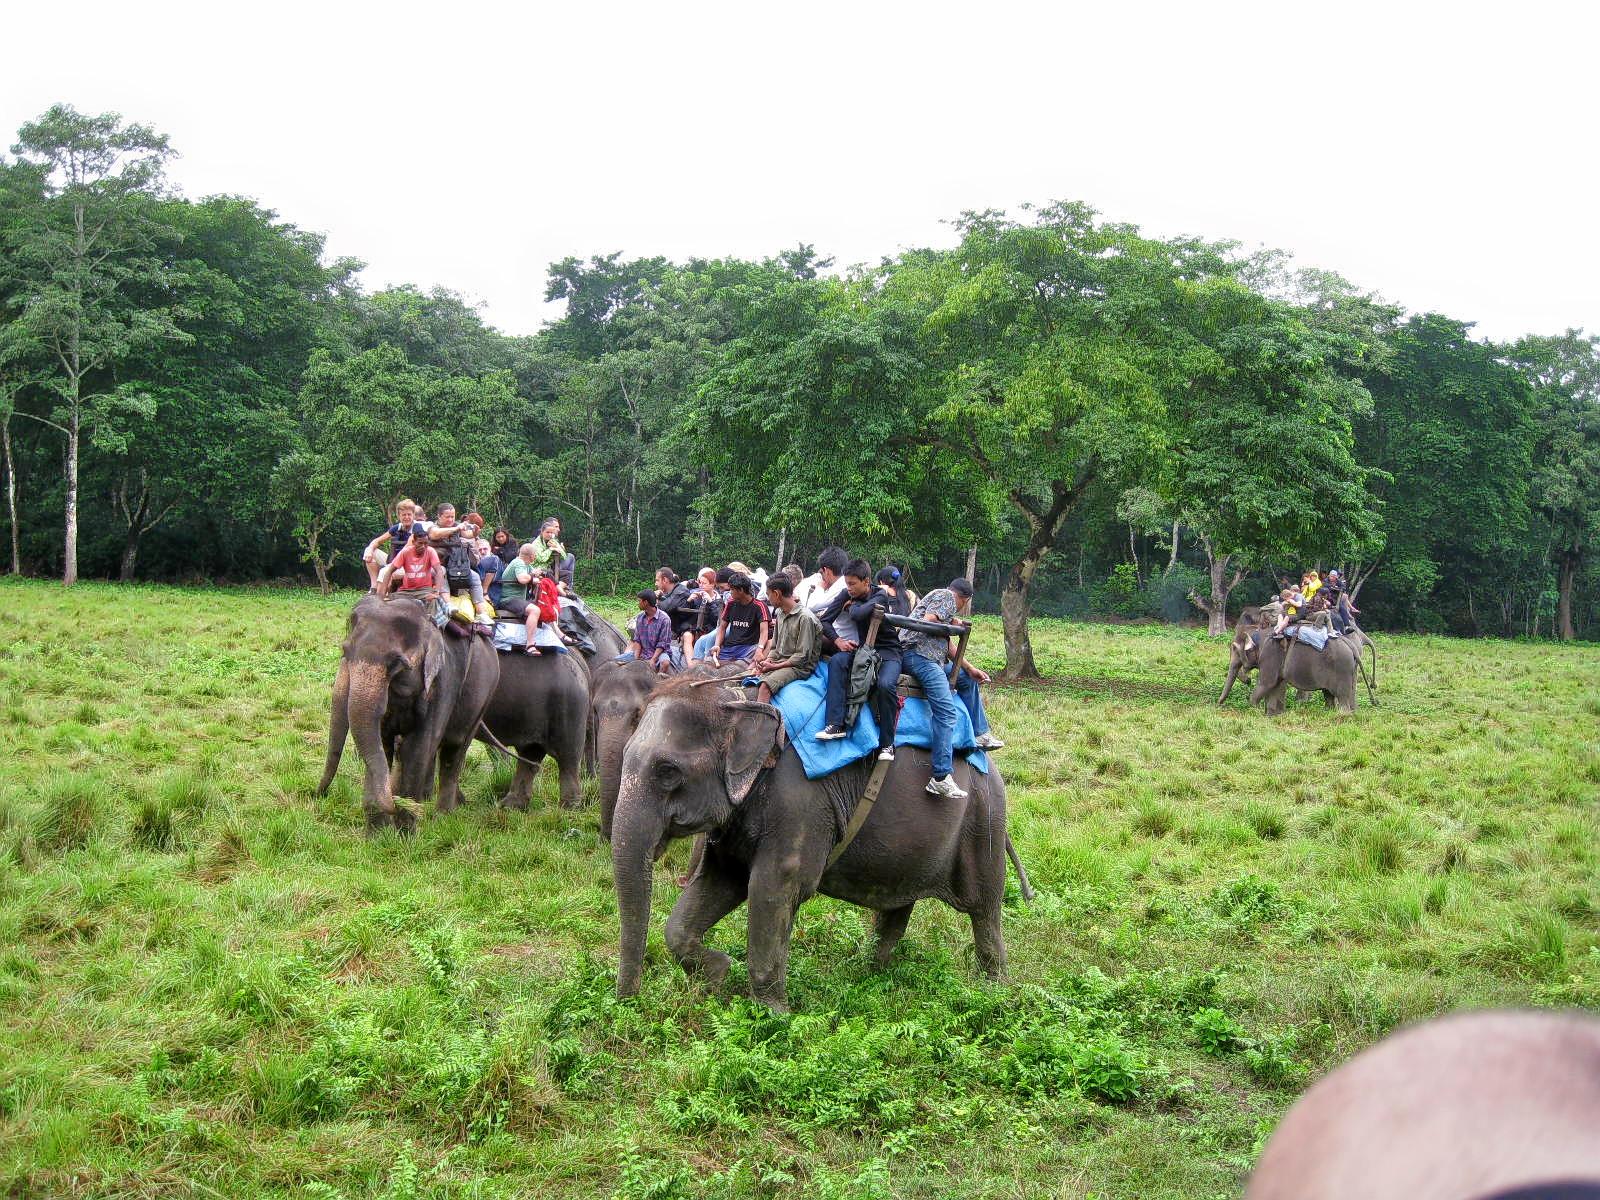 1559045370_chitwan_national_park__282010_29-87.jpg